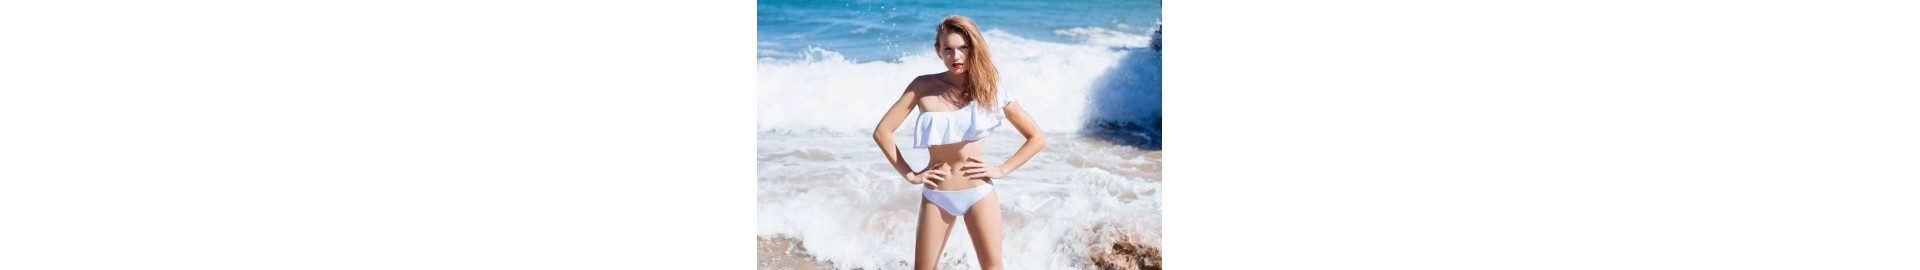 Bikinis PILLERT, trajes de baños dos piezas para mujer.